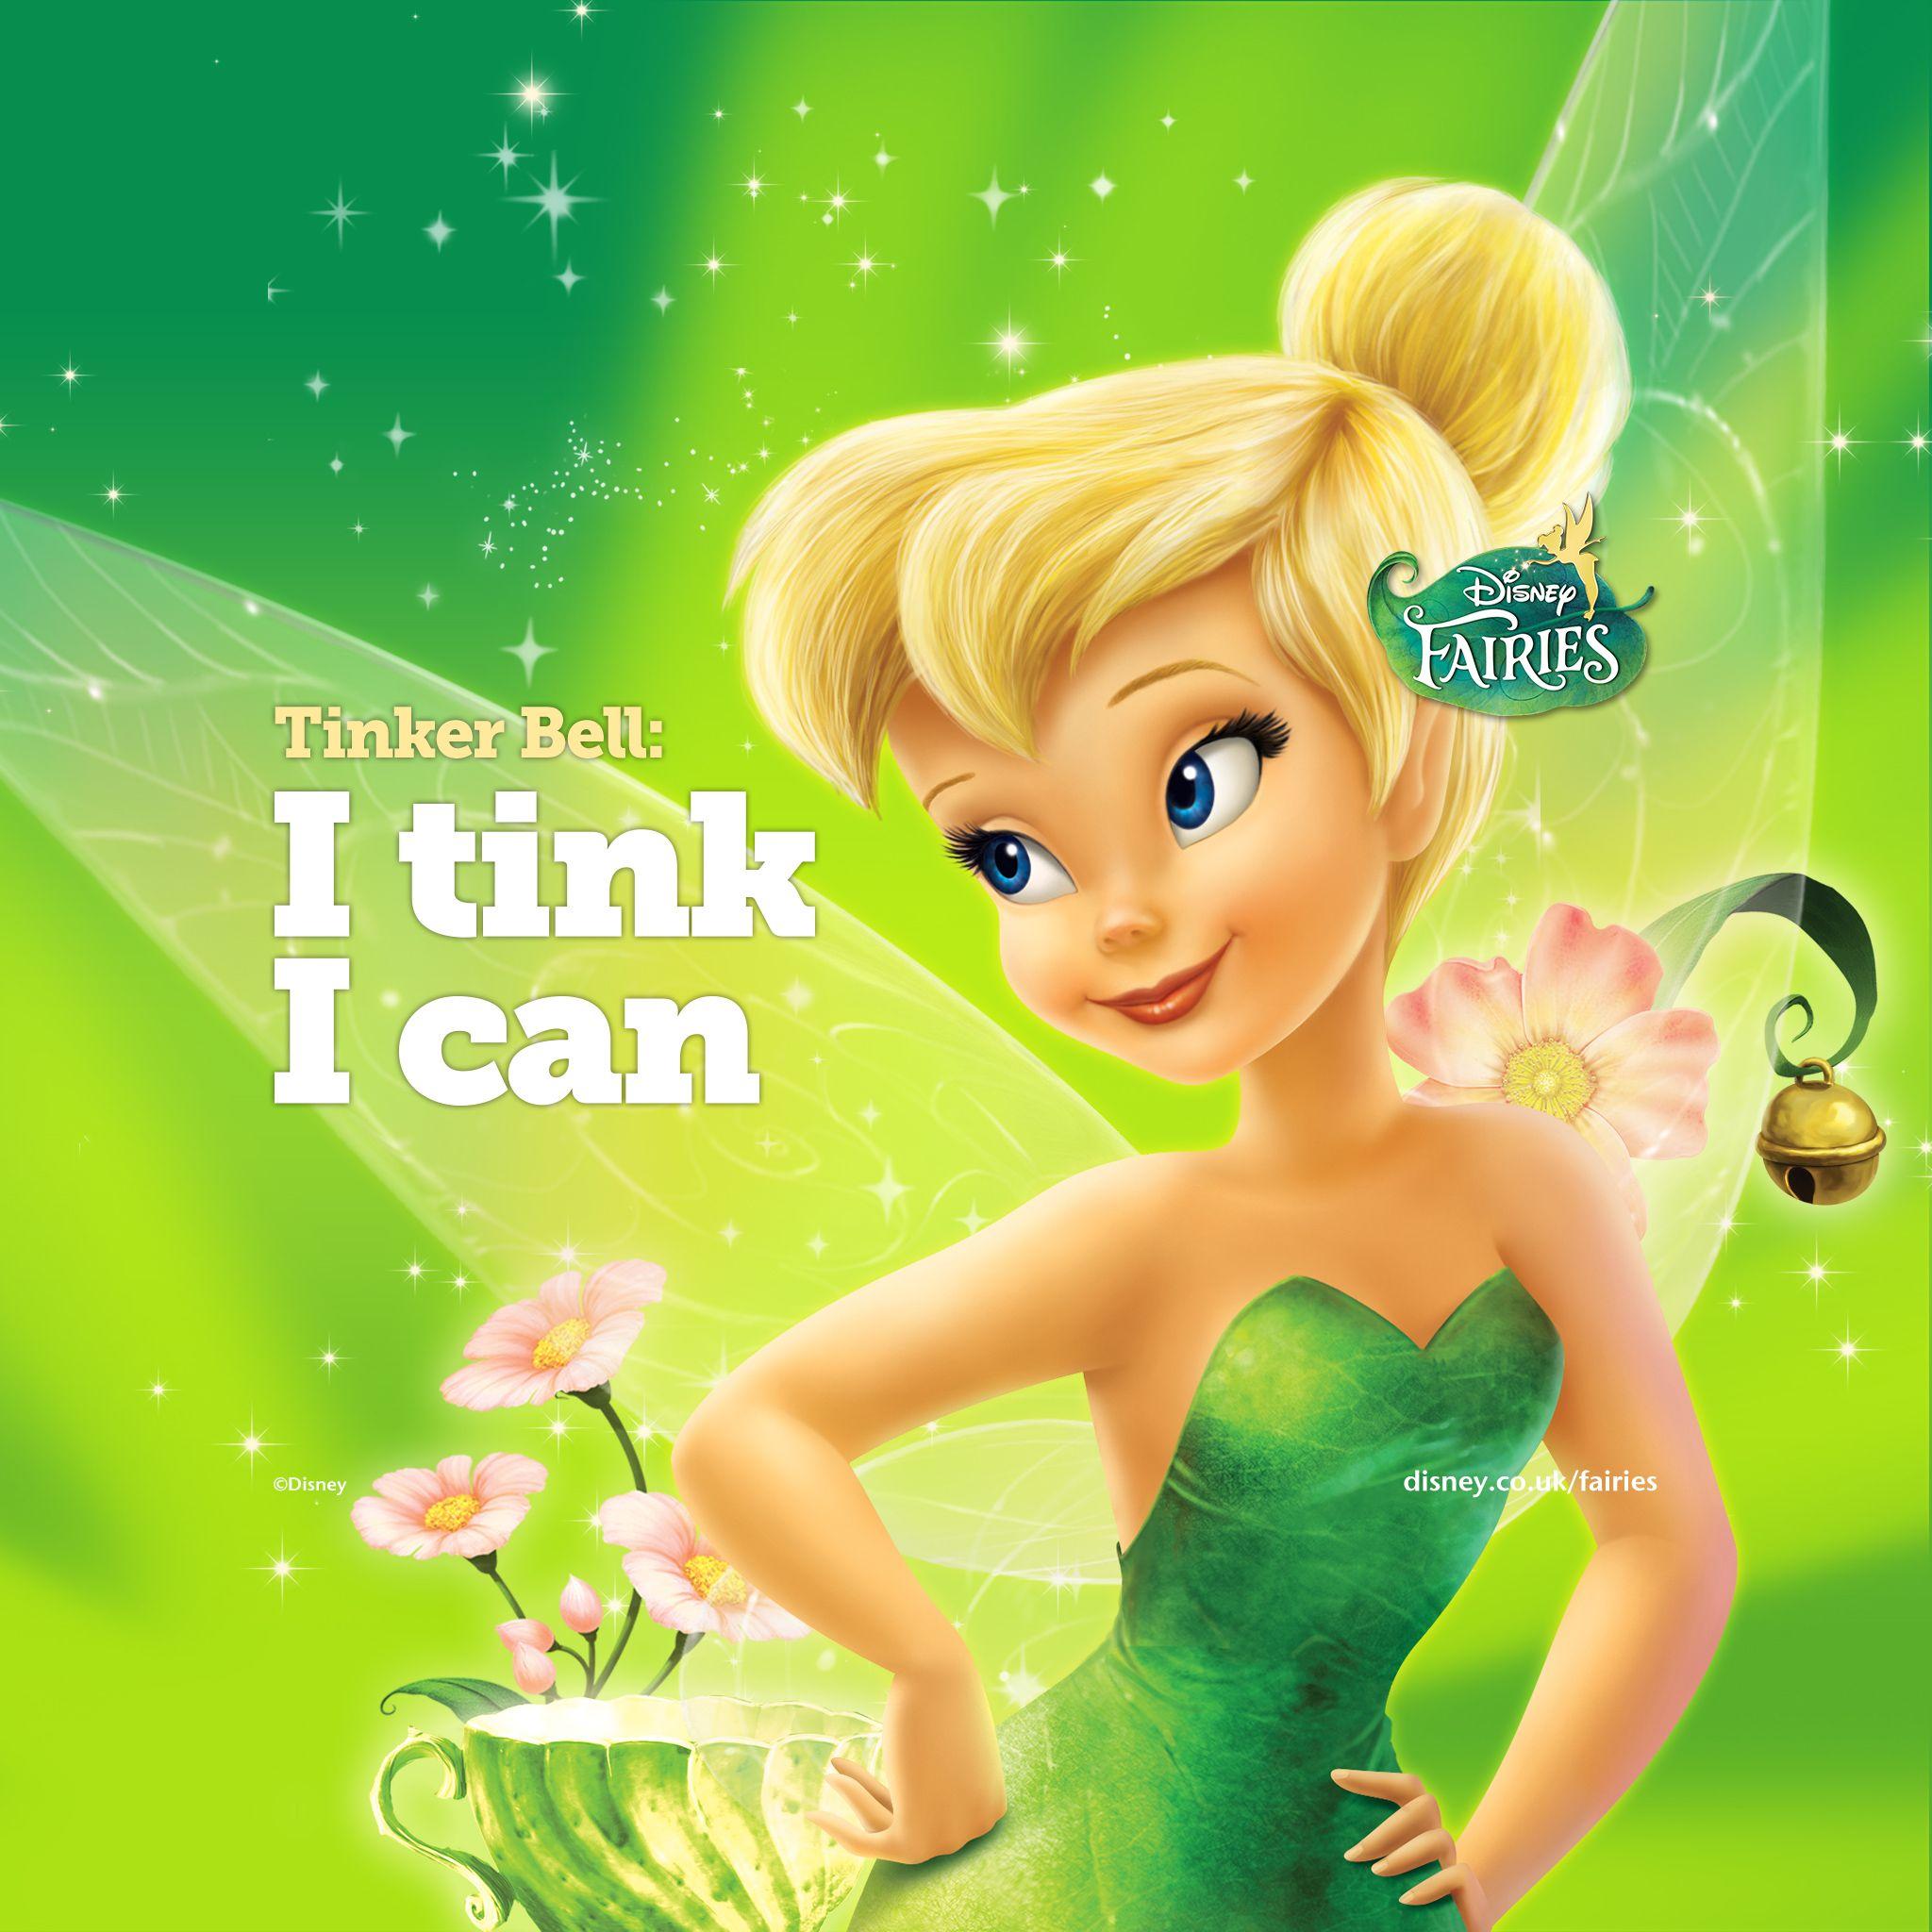 Disney Fairies Tinkerbell Tink Tinker Bell Ipad Tinkerbell